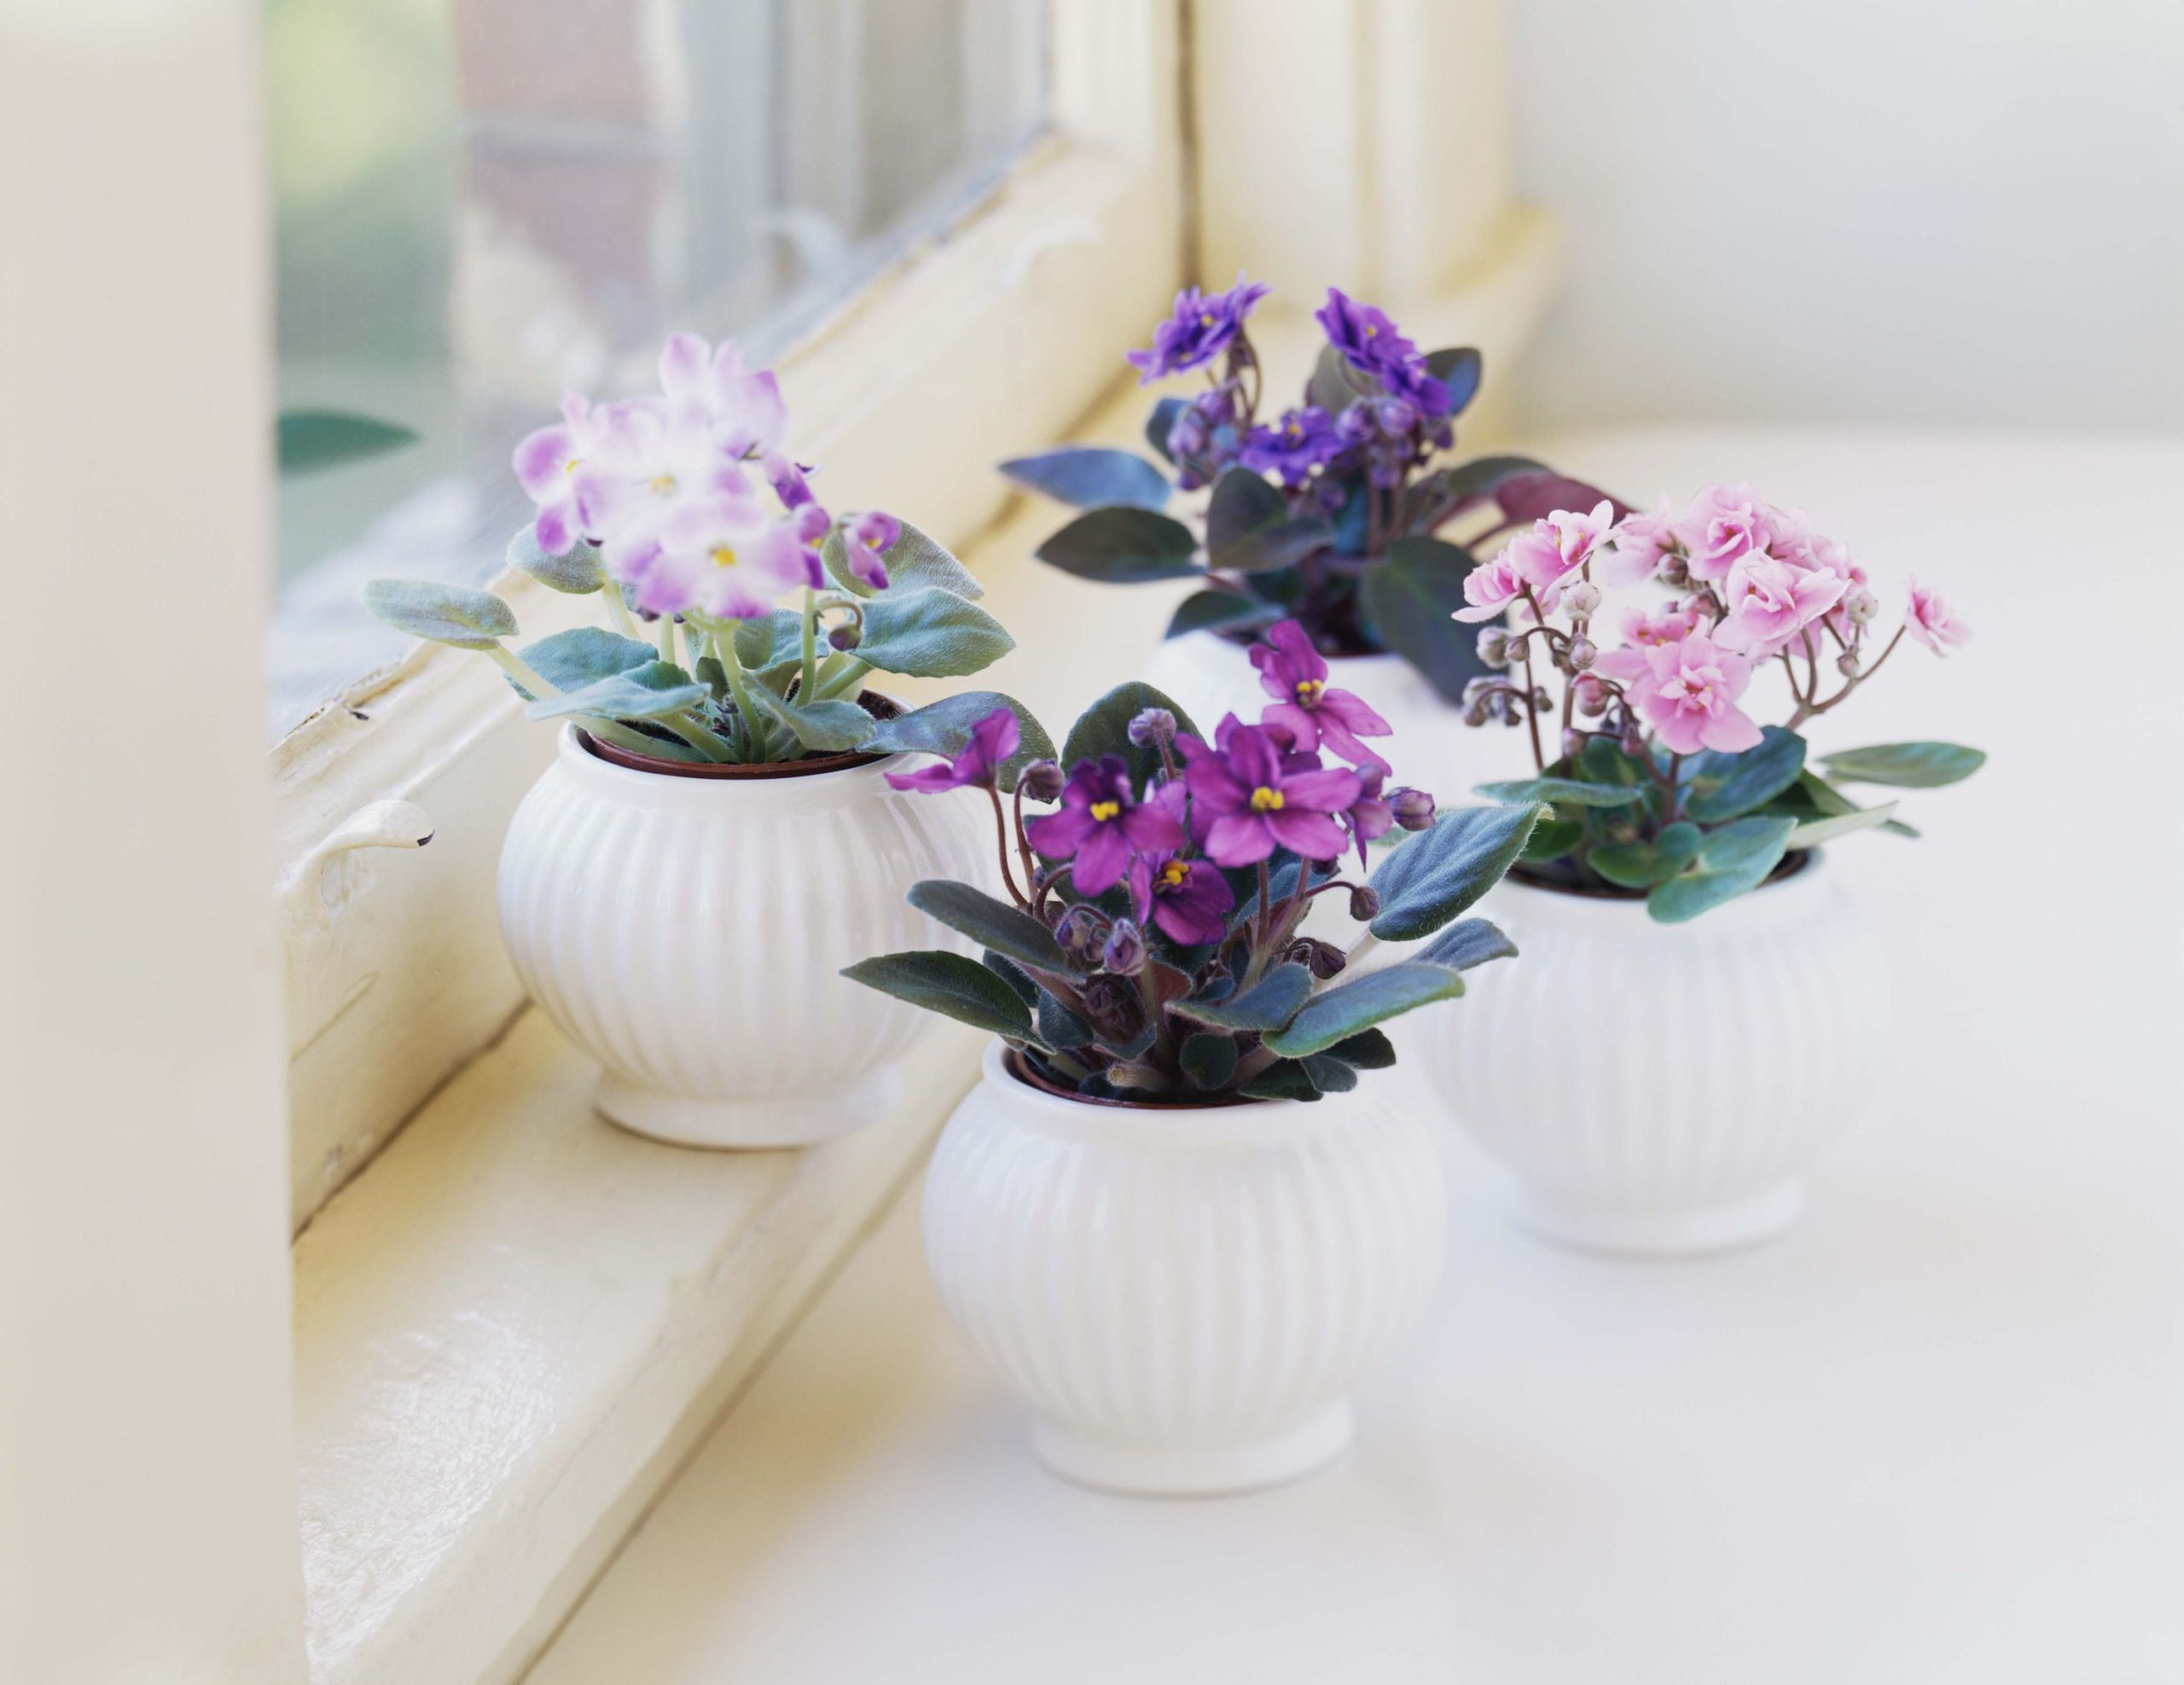 easy to maintain houseplants